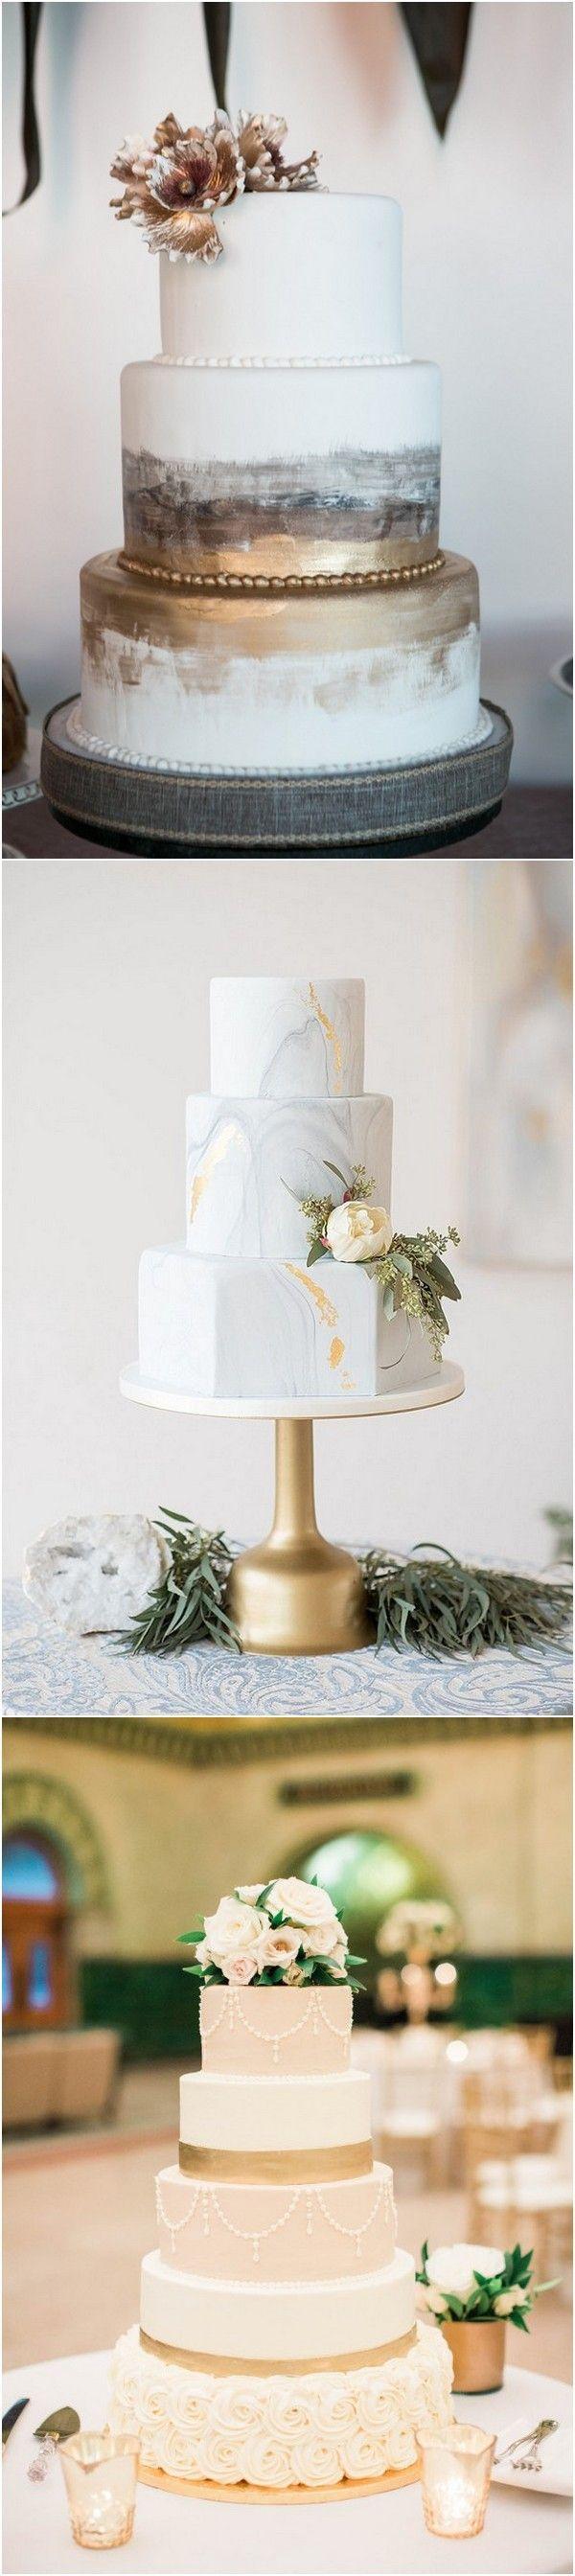 Trending creative metallic wedding cakes for metallic